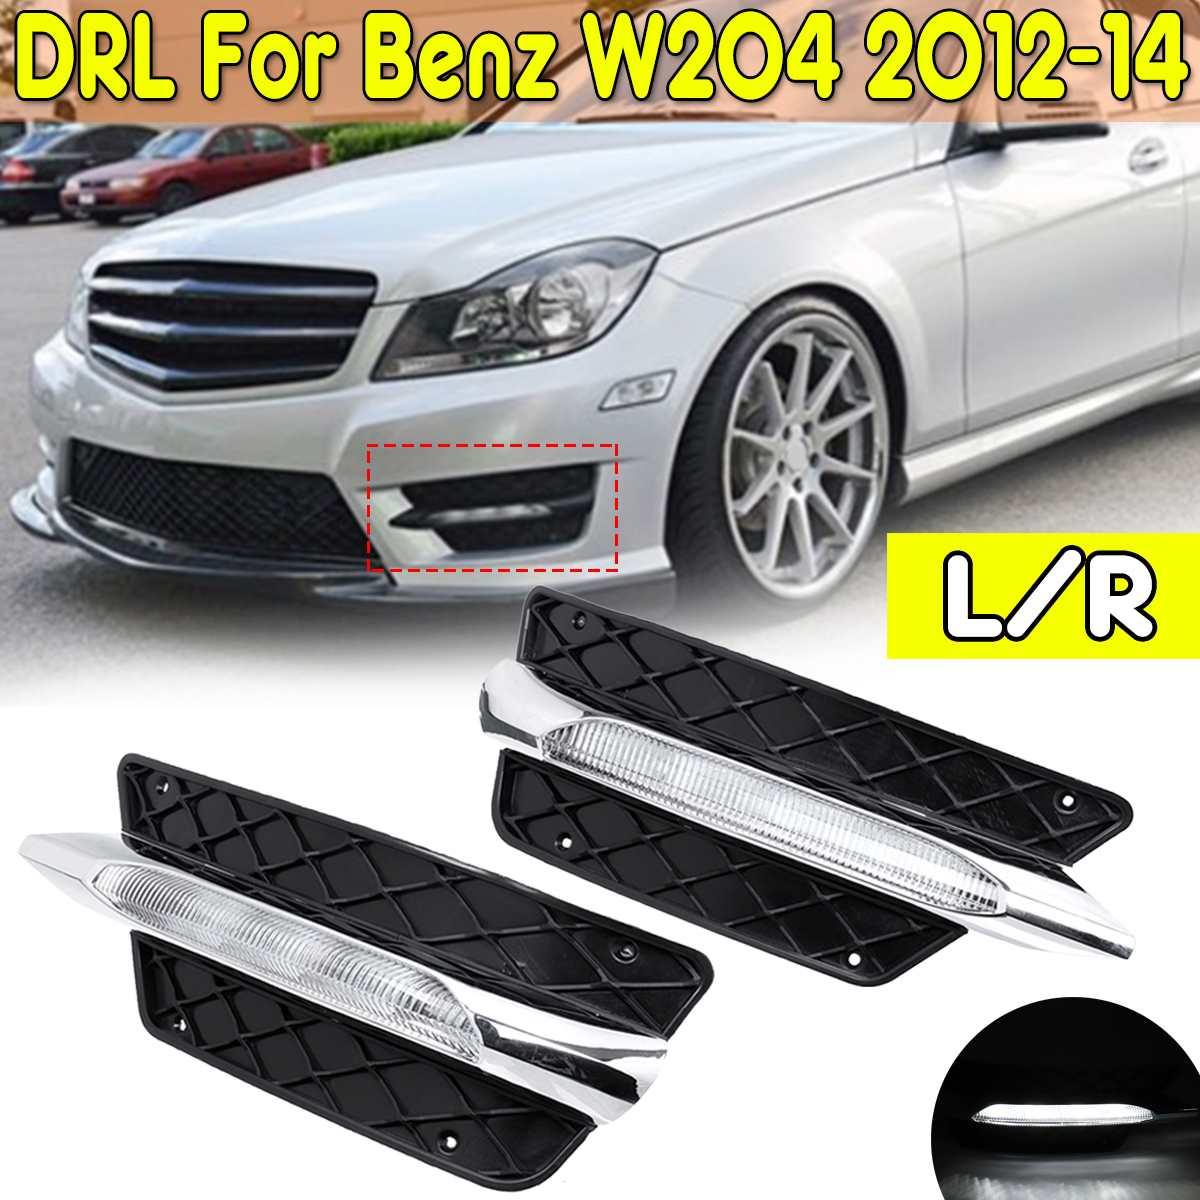 R/L Front Bumper Grill Molding LED Fog Light  Daytime Running Light Fog Lamp For Mercedes For Benz W204 C-Class 2012-14 DRL Only